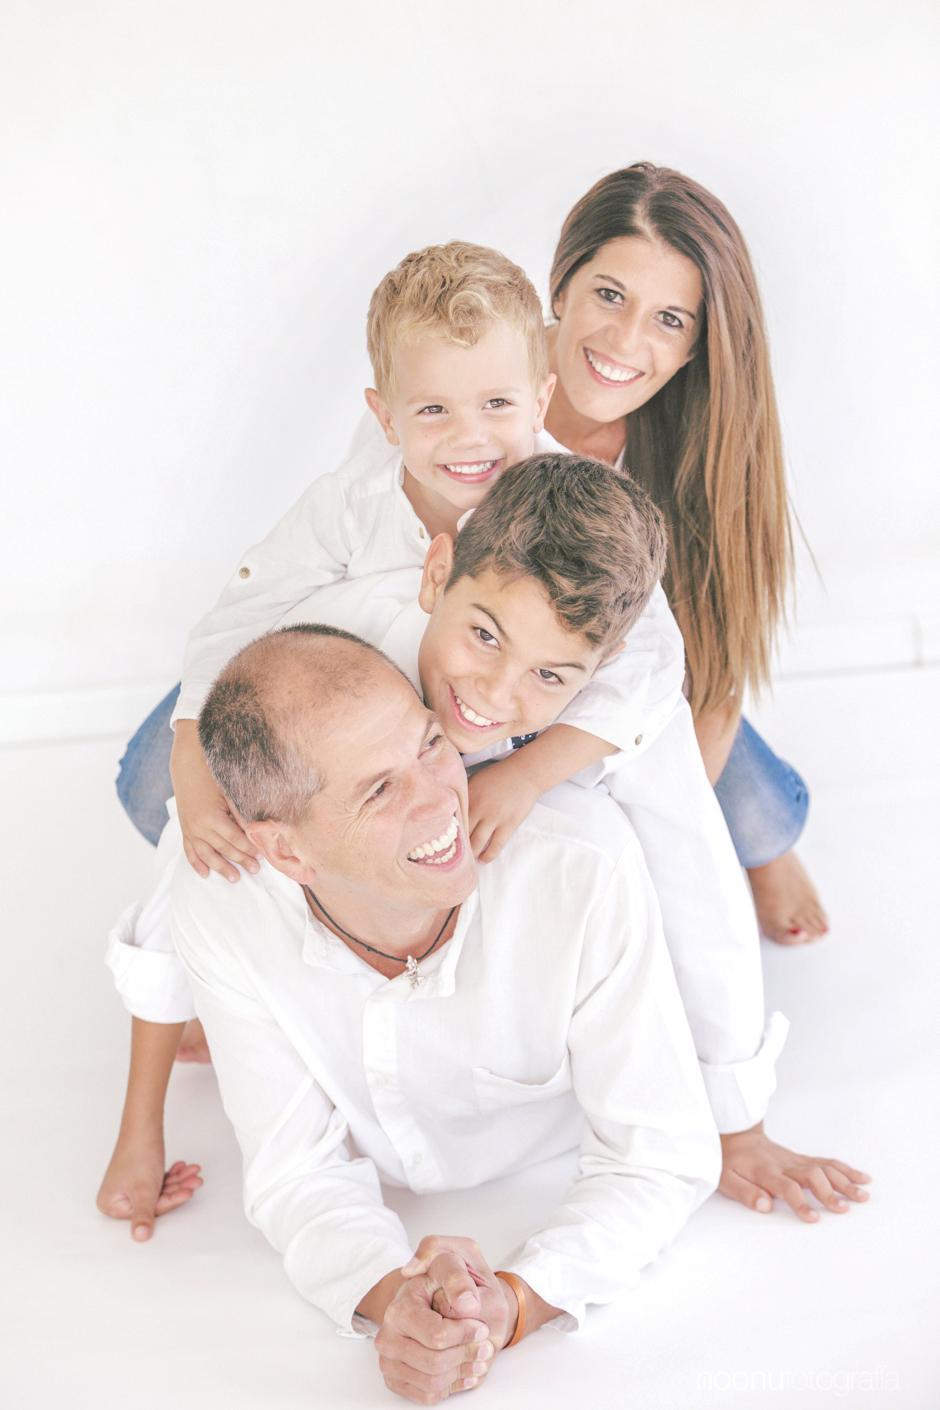 noonu-reportajes-de-familia-madrid-3-2